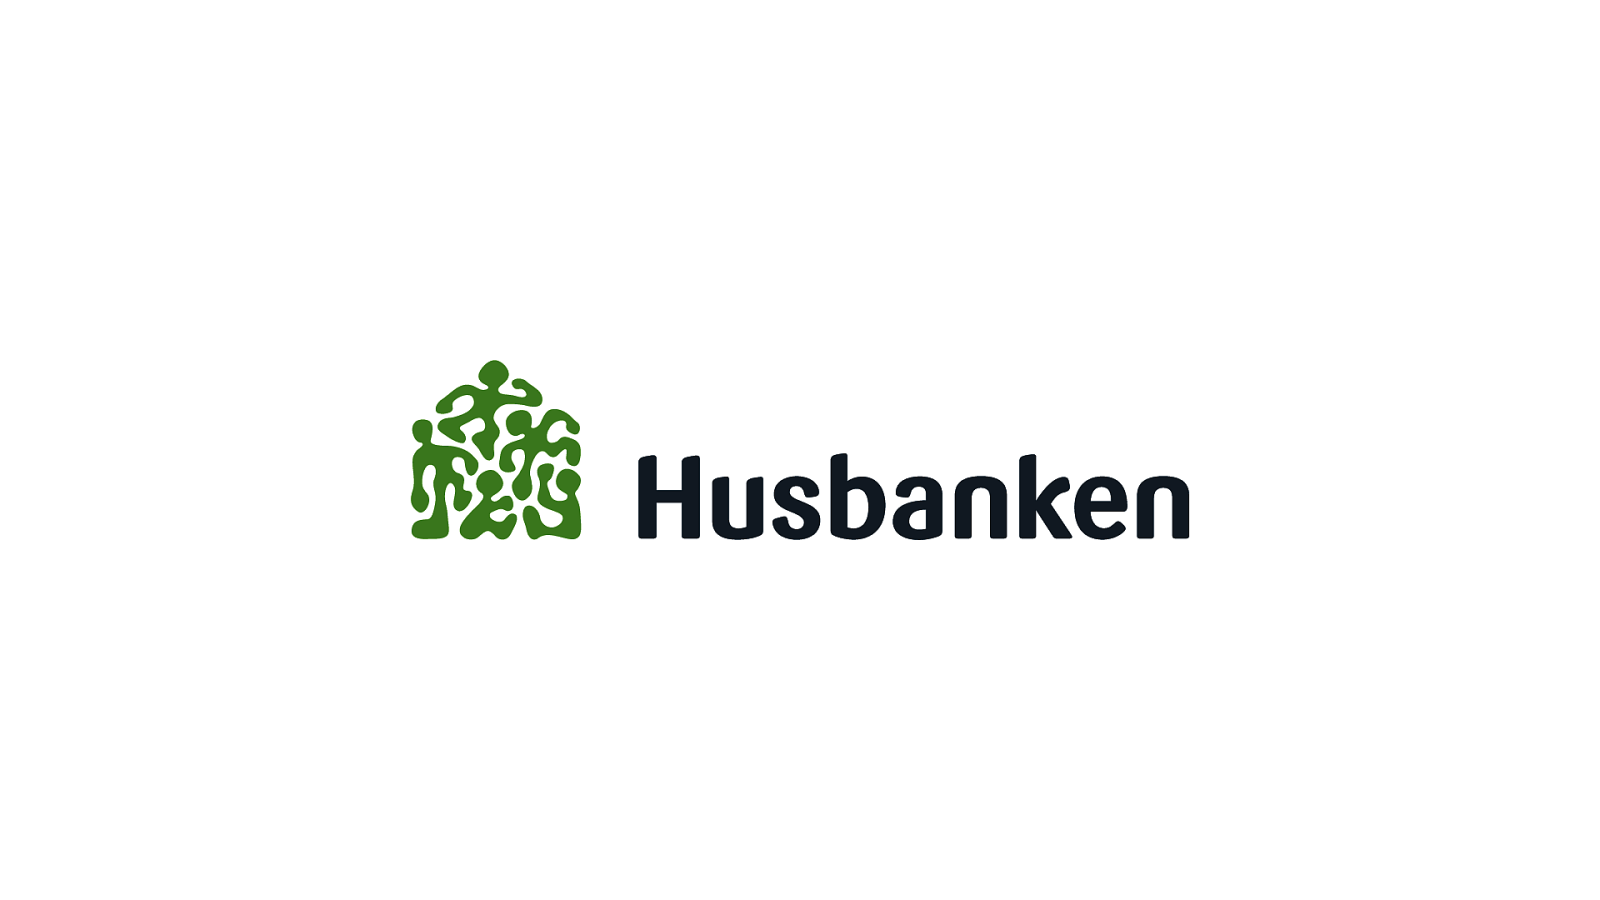 Husbanken Designsystem by Ronny Siikaluoma